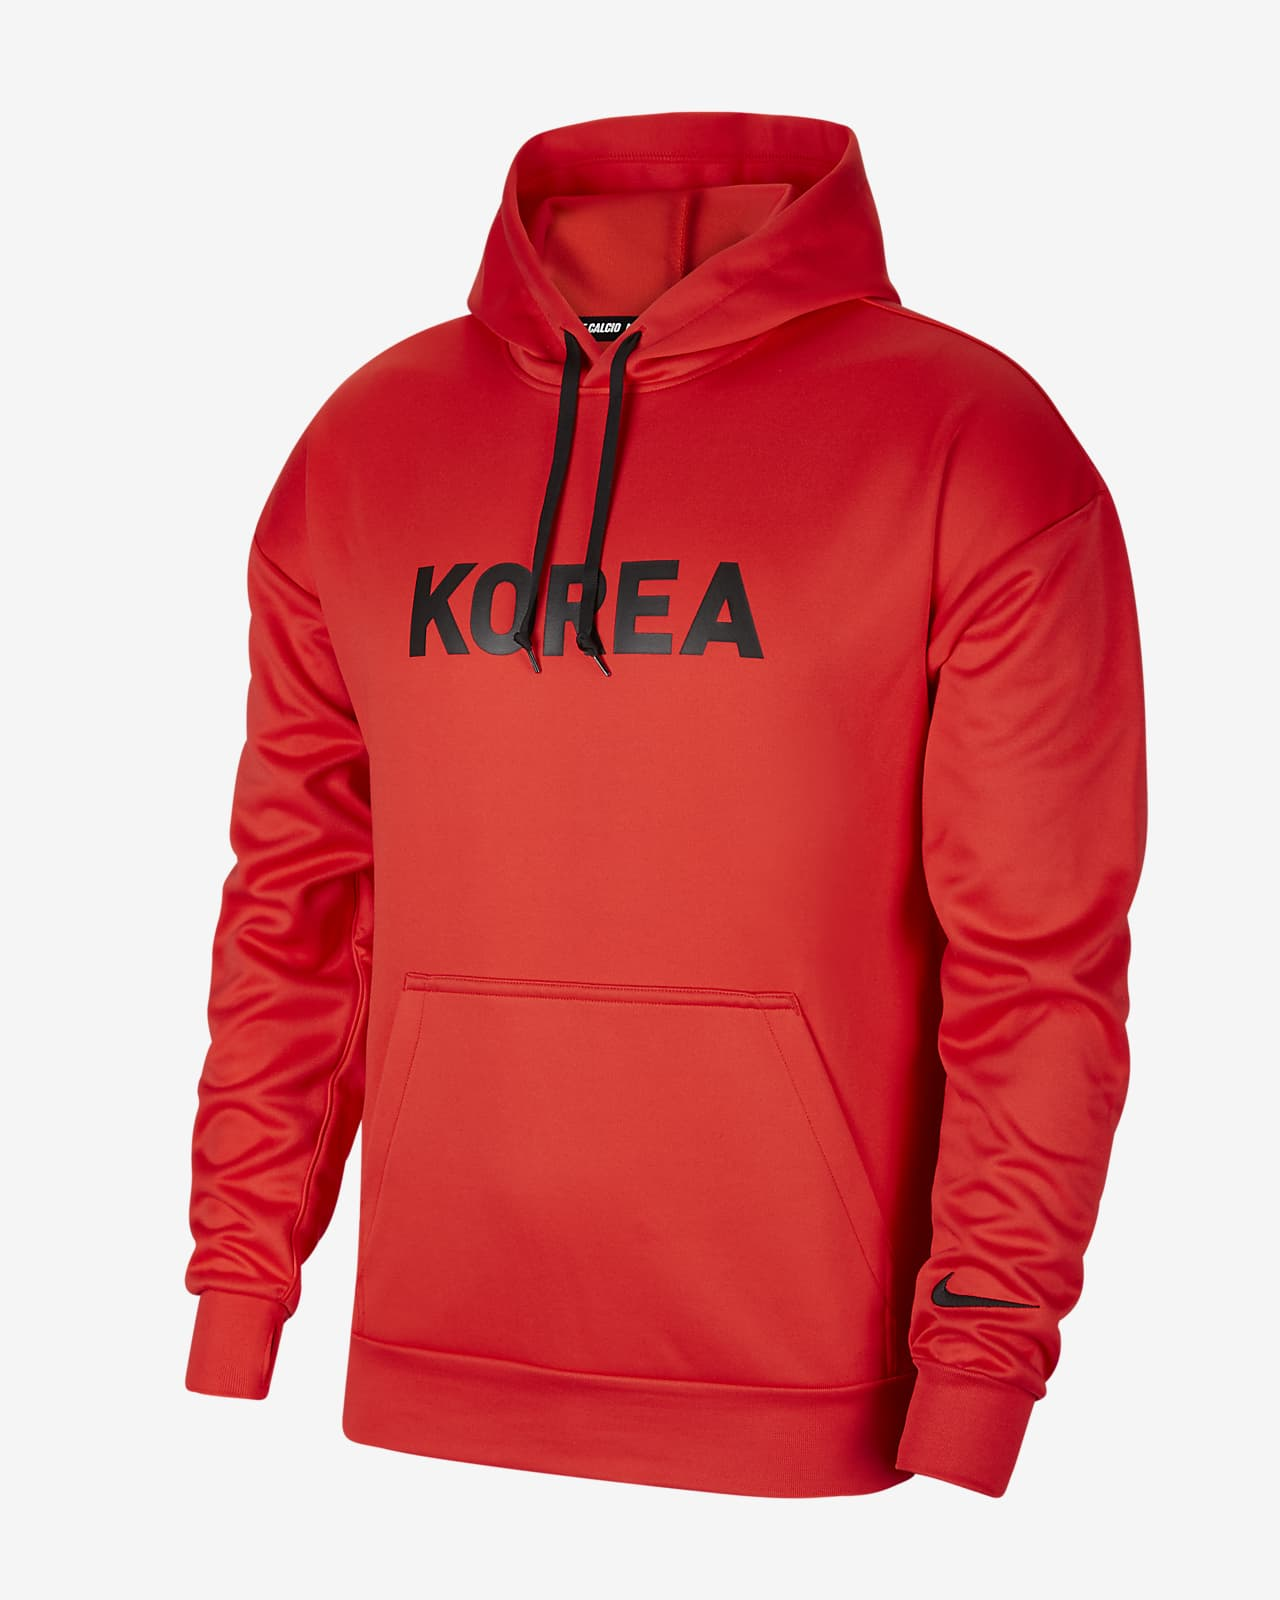 Korea Men's Pullover Football Hoodie